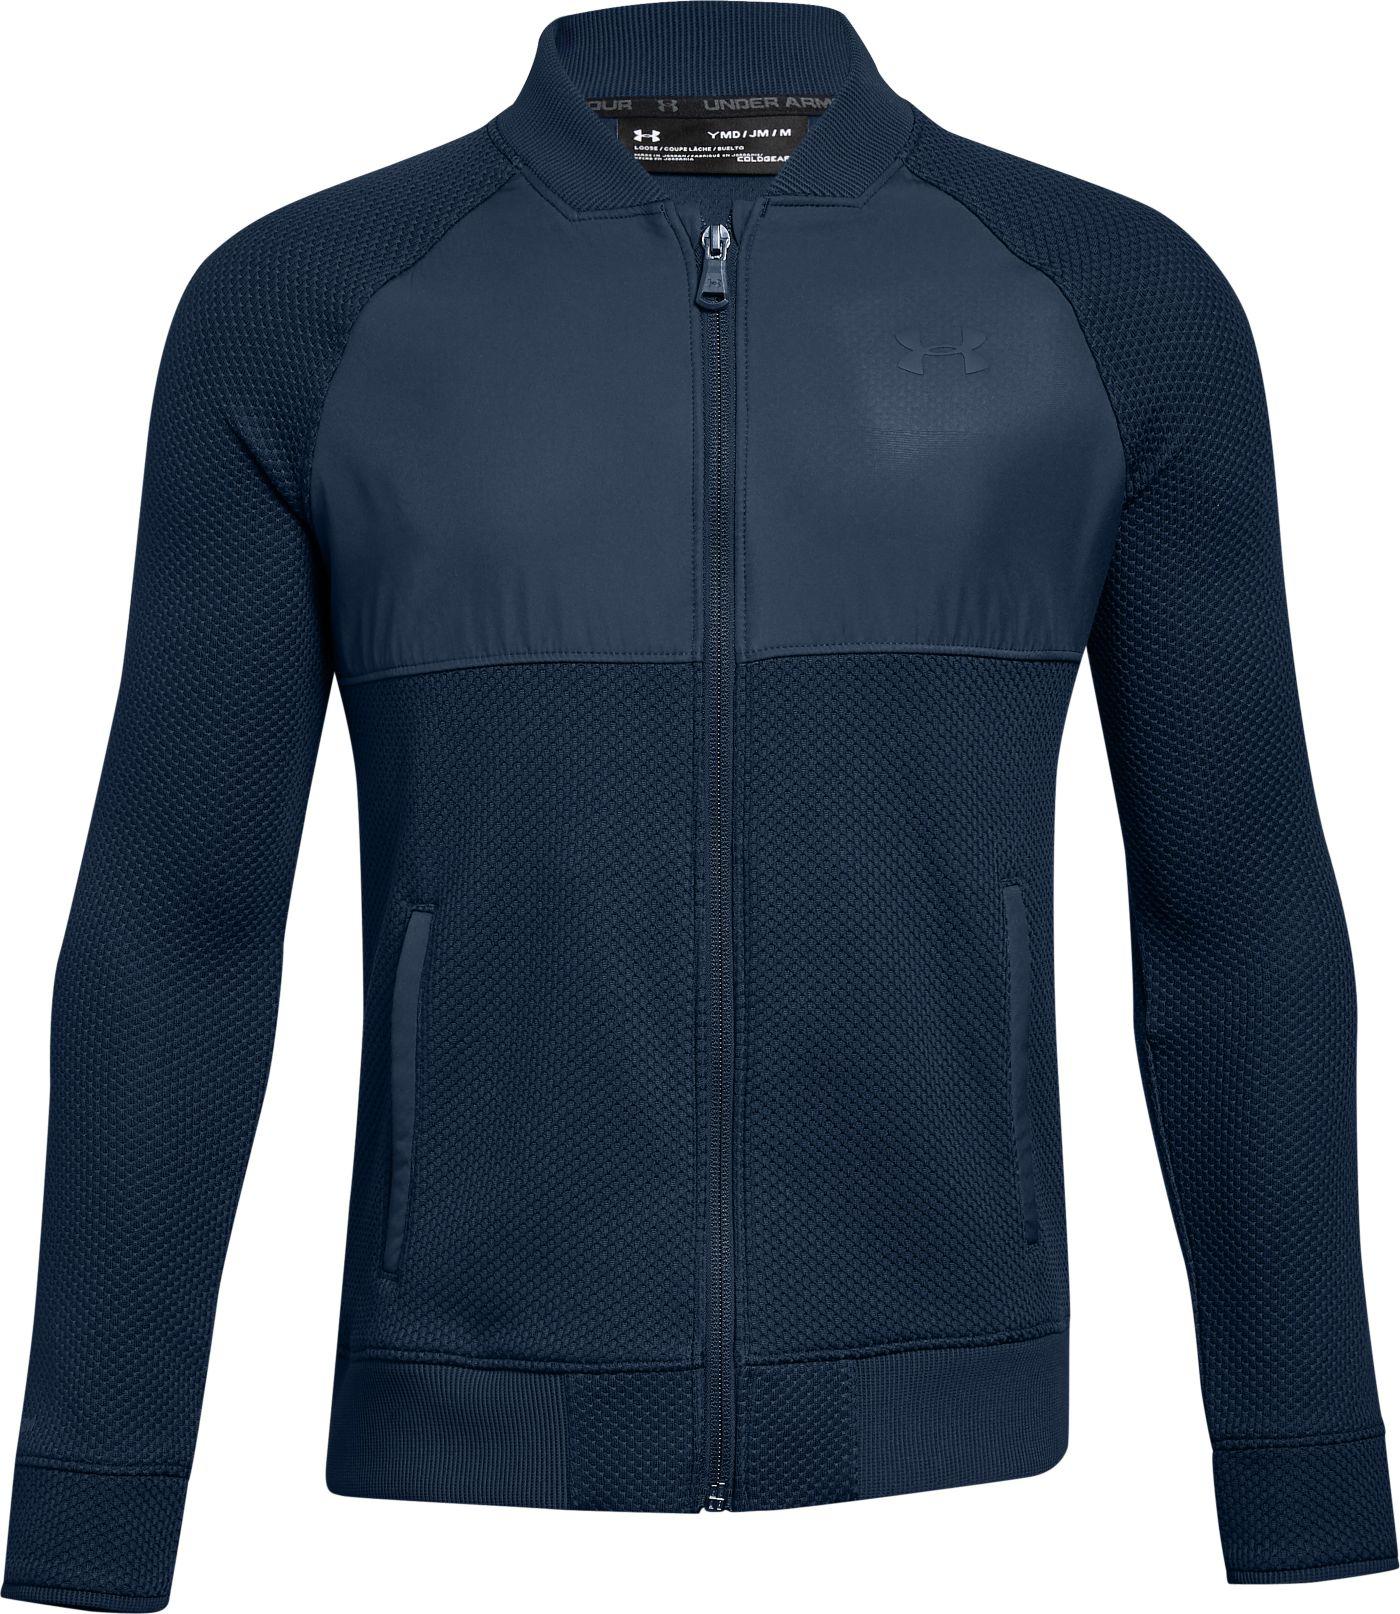 Under Armour Boys' Storm SweaterFleece Hybrid Golf Jacket